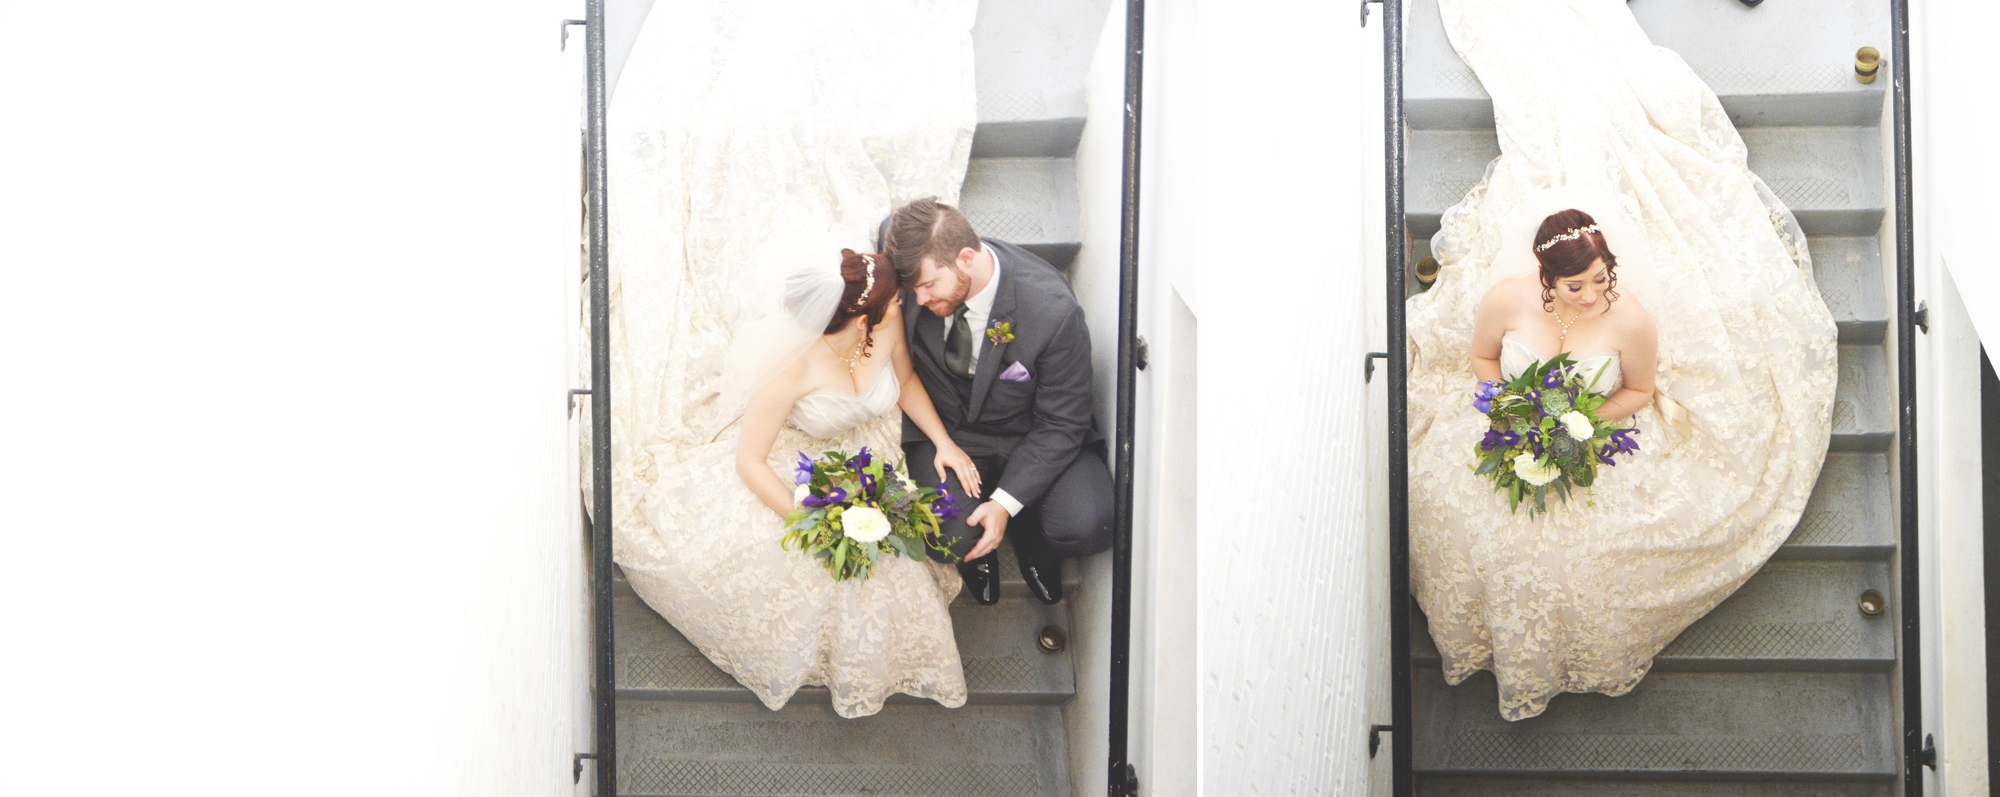 ambient-studio-wedding-photography-six-hearts-photography035